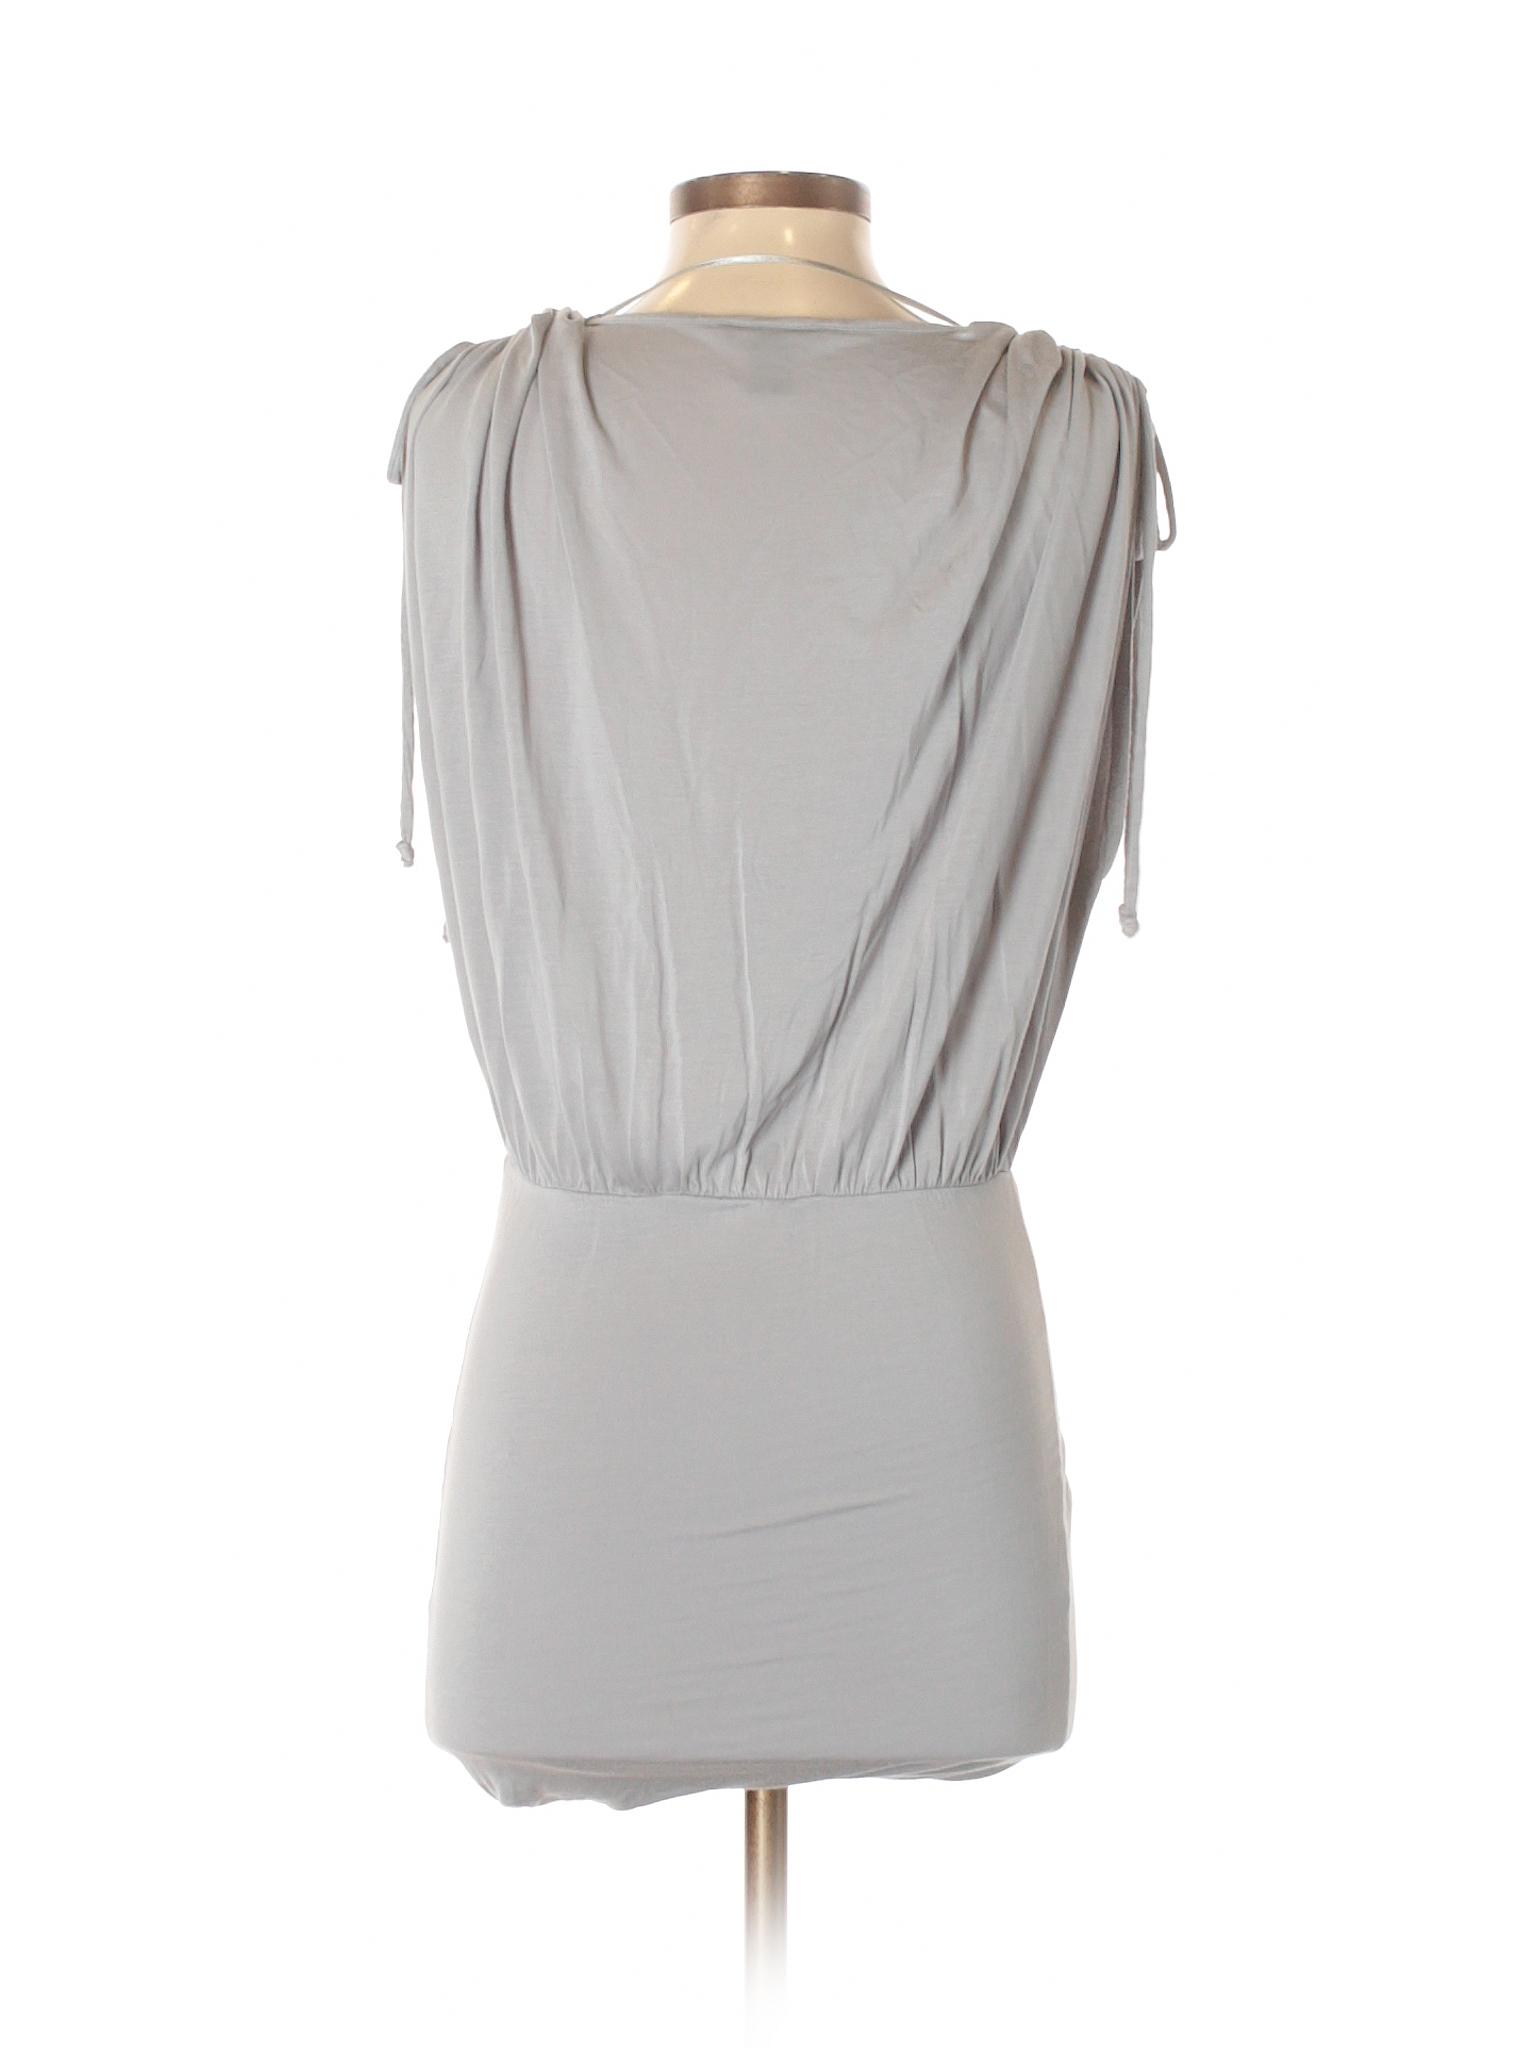 winter Dress H Boutique Casual amp;M WvTq6U0